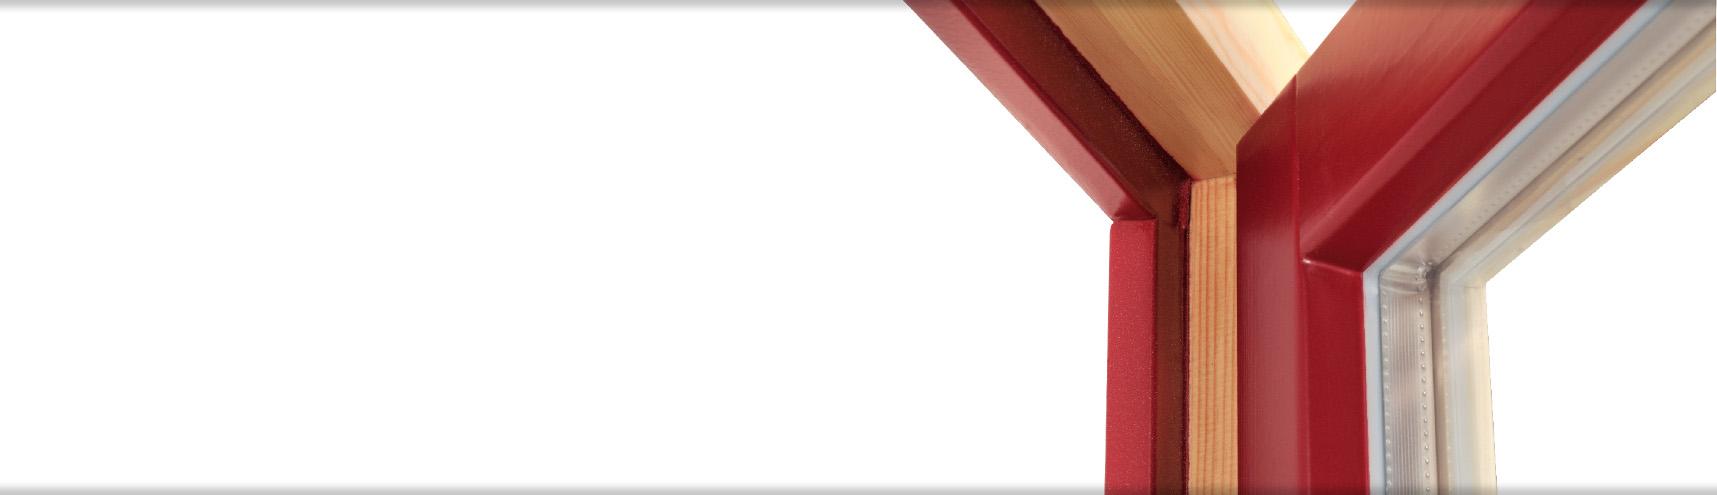 Fenetre Couleurs 100 teintes Naboco Menuiserie